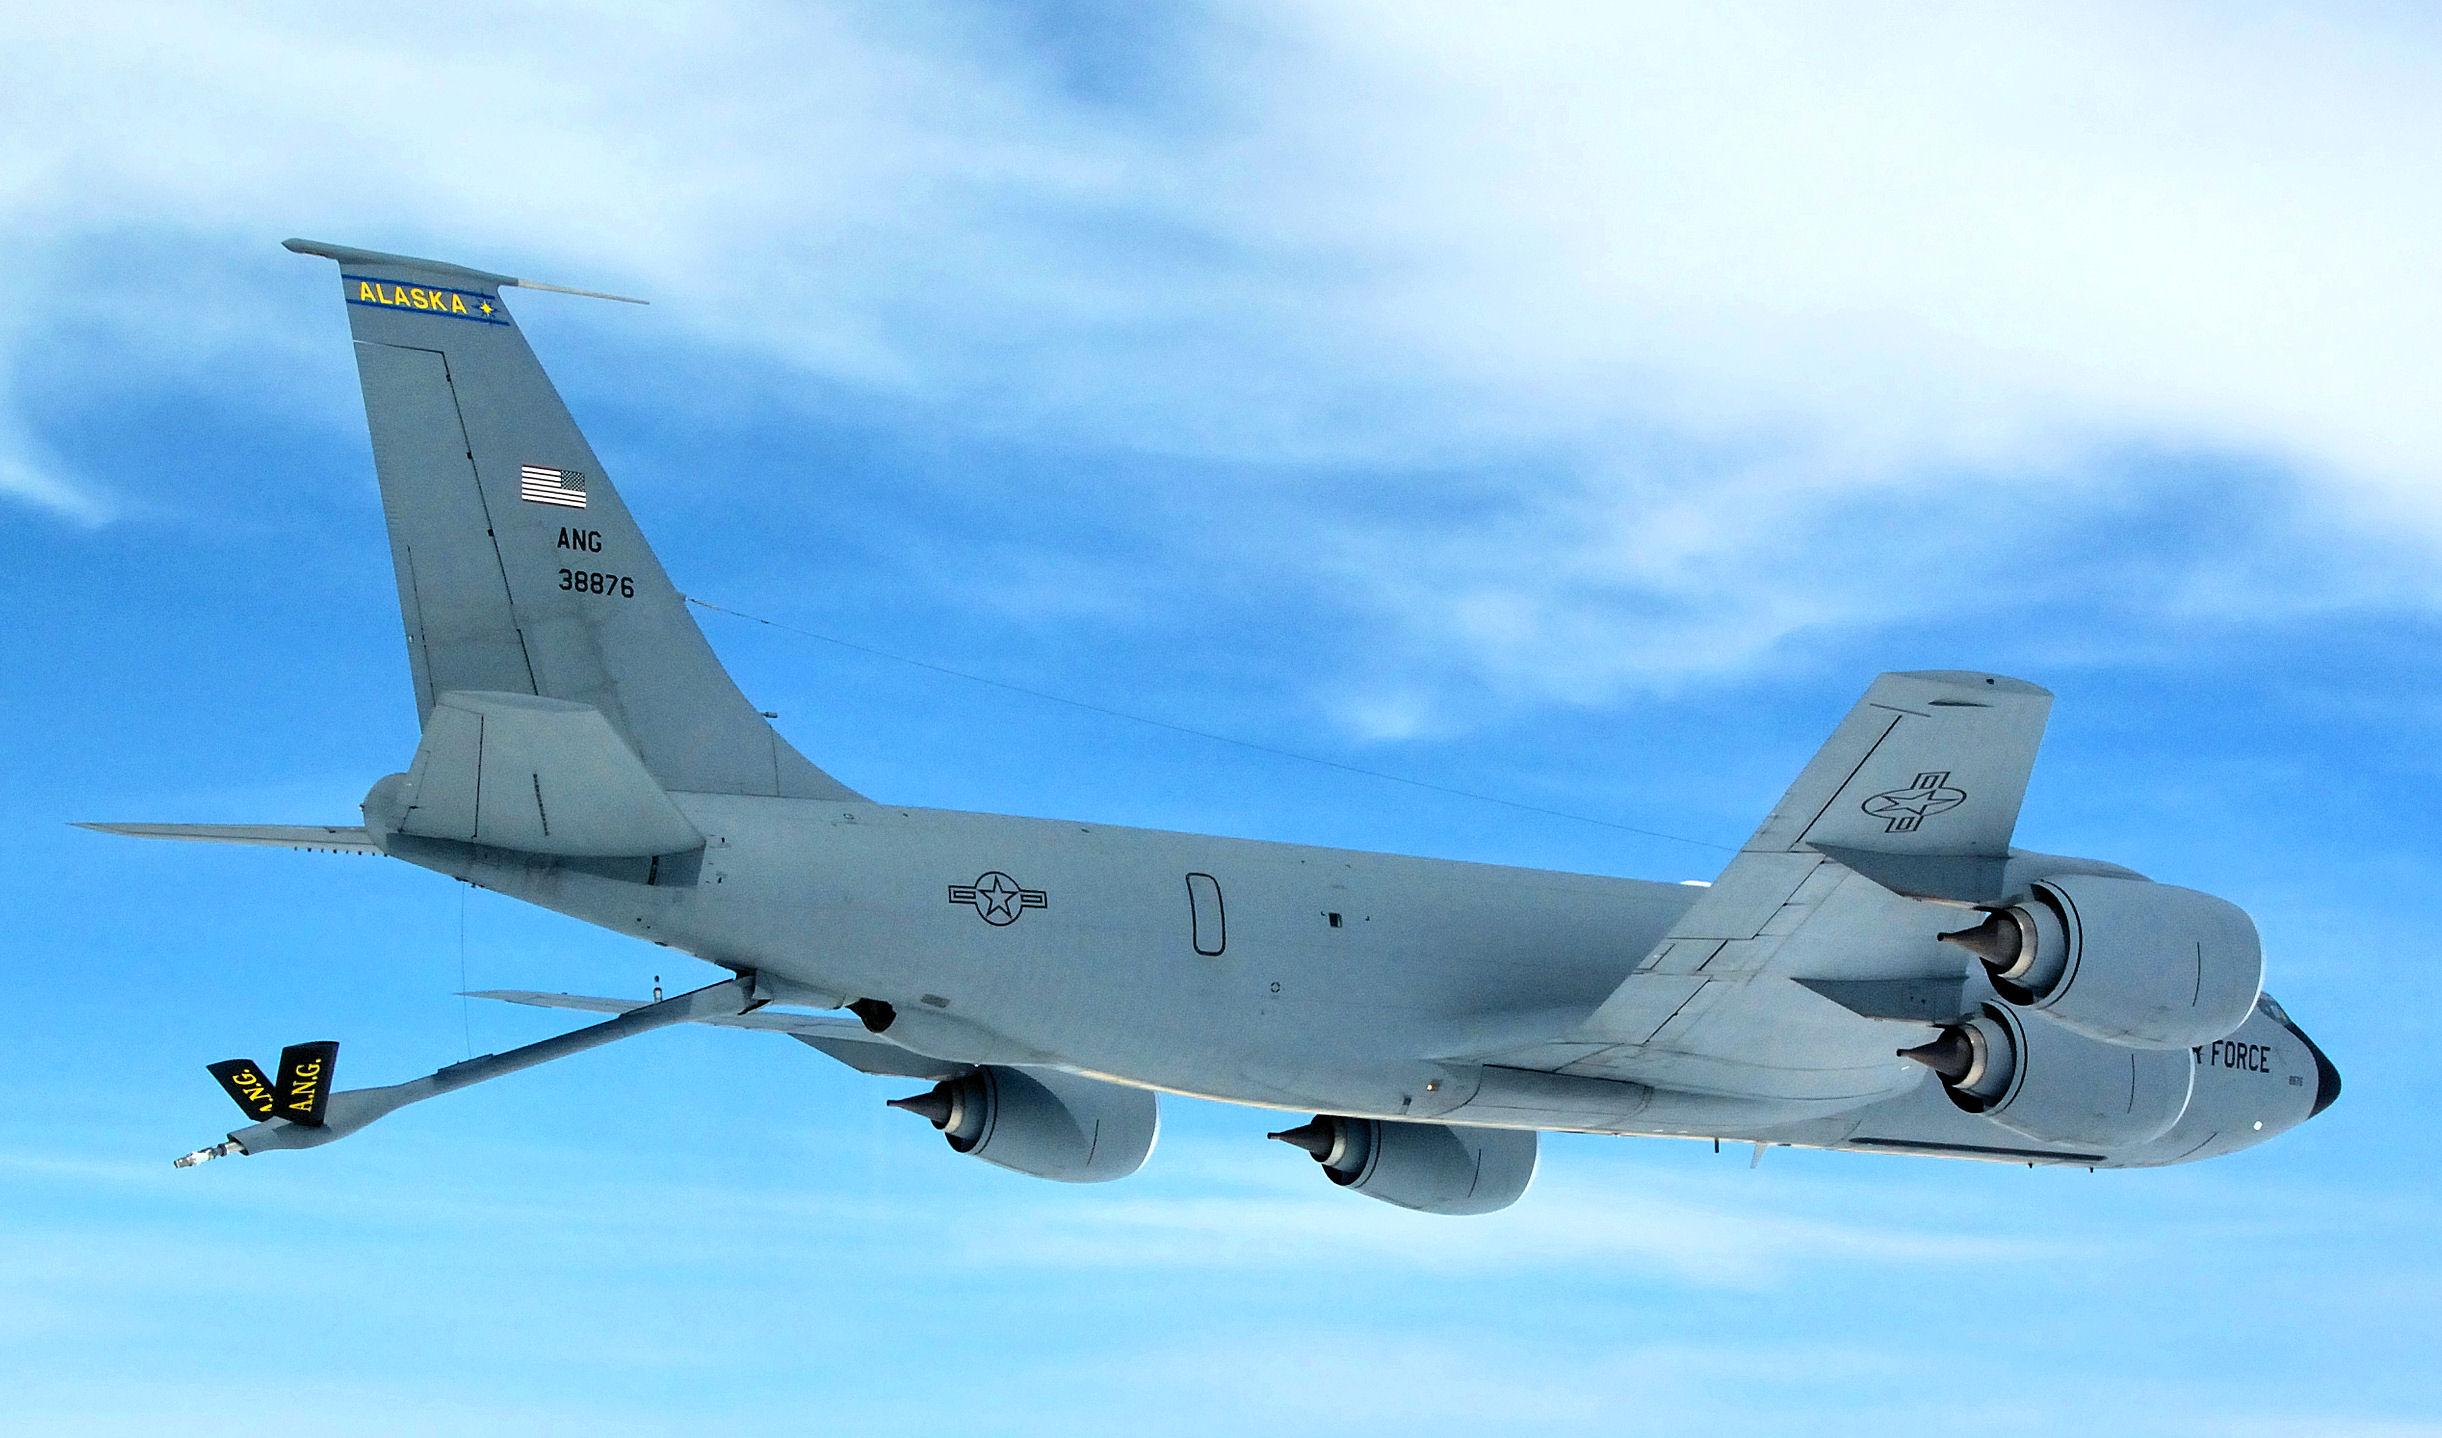 168th Air Refueling Squadron - Boeing KC-135R Stratotanker 63-8876 - 2.jpg